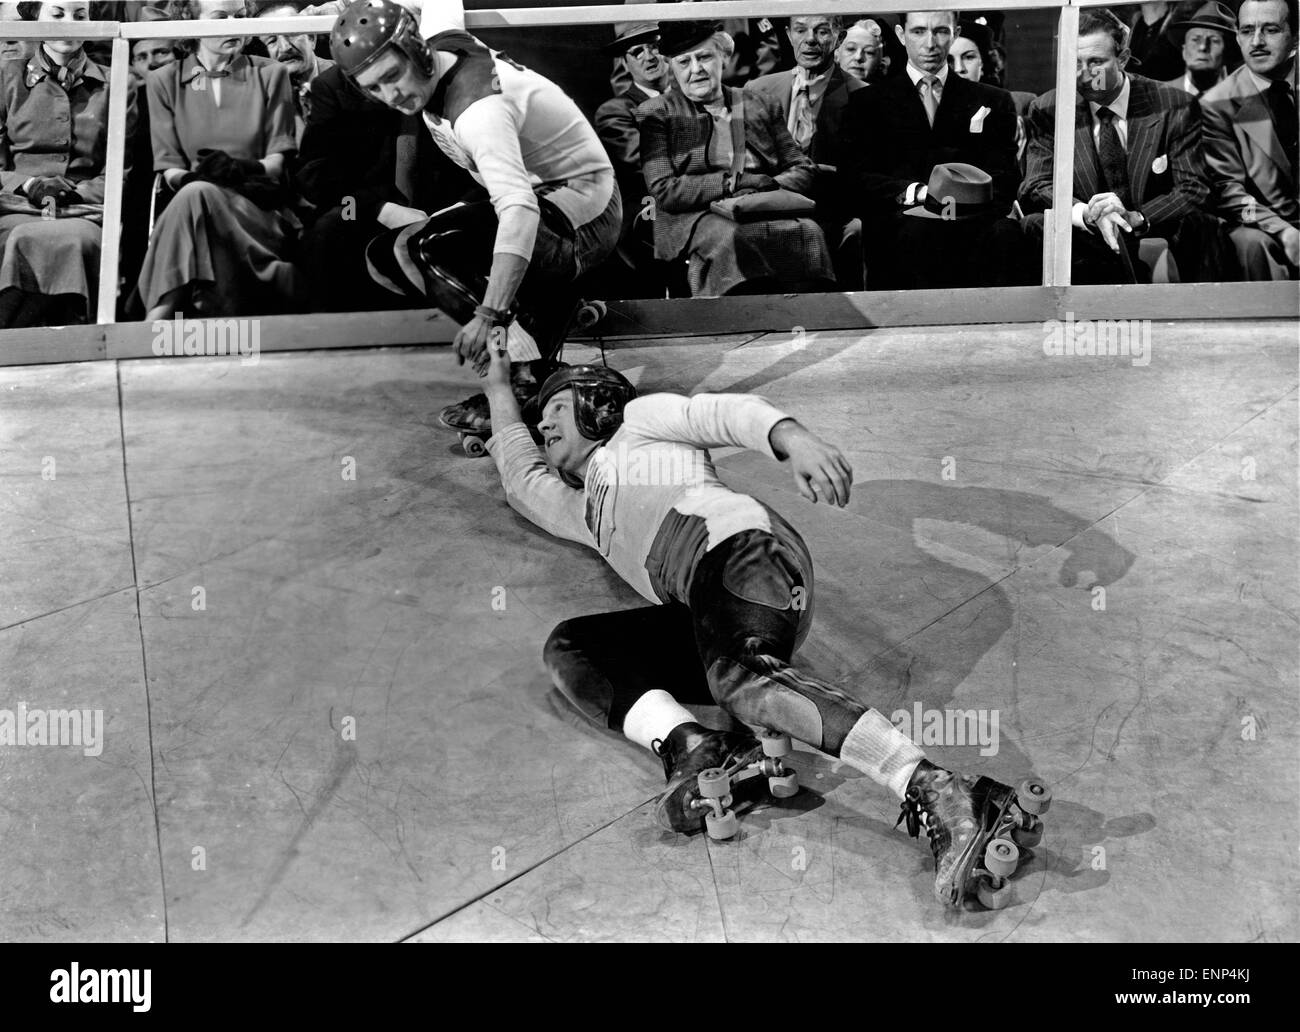 Der Feuerball, USA 1950, auch bekannt als: Rollschuhfieber, Regie: Tay Carnett, Monia: Mickey Rooney Stockfoto